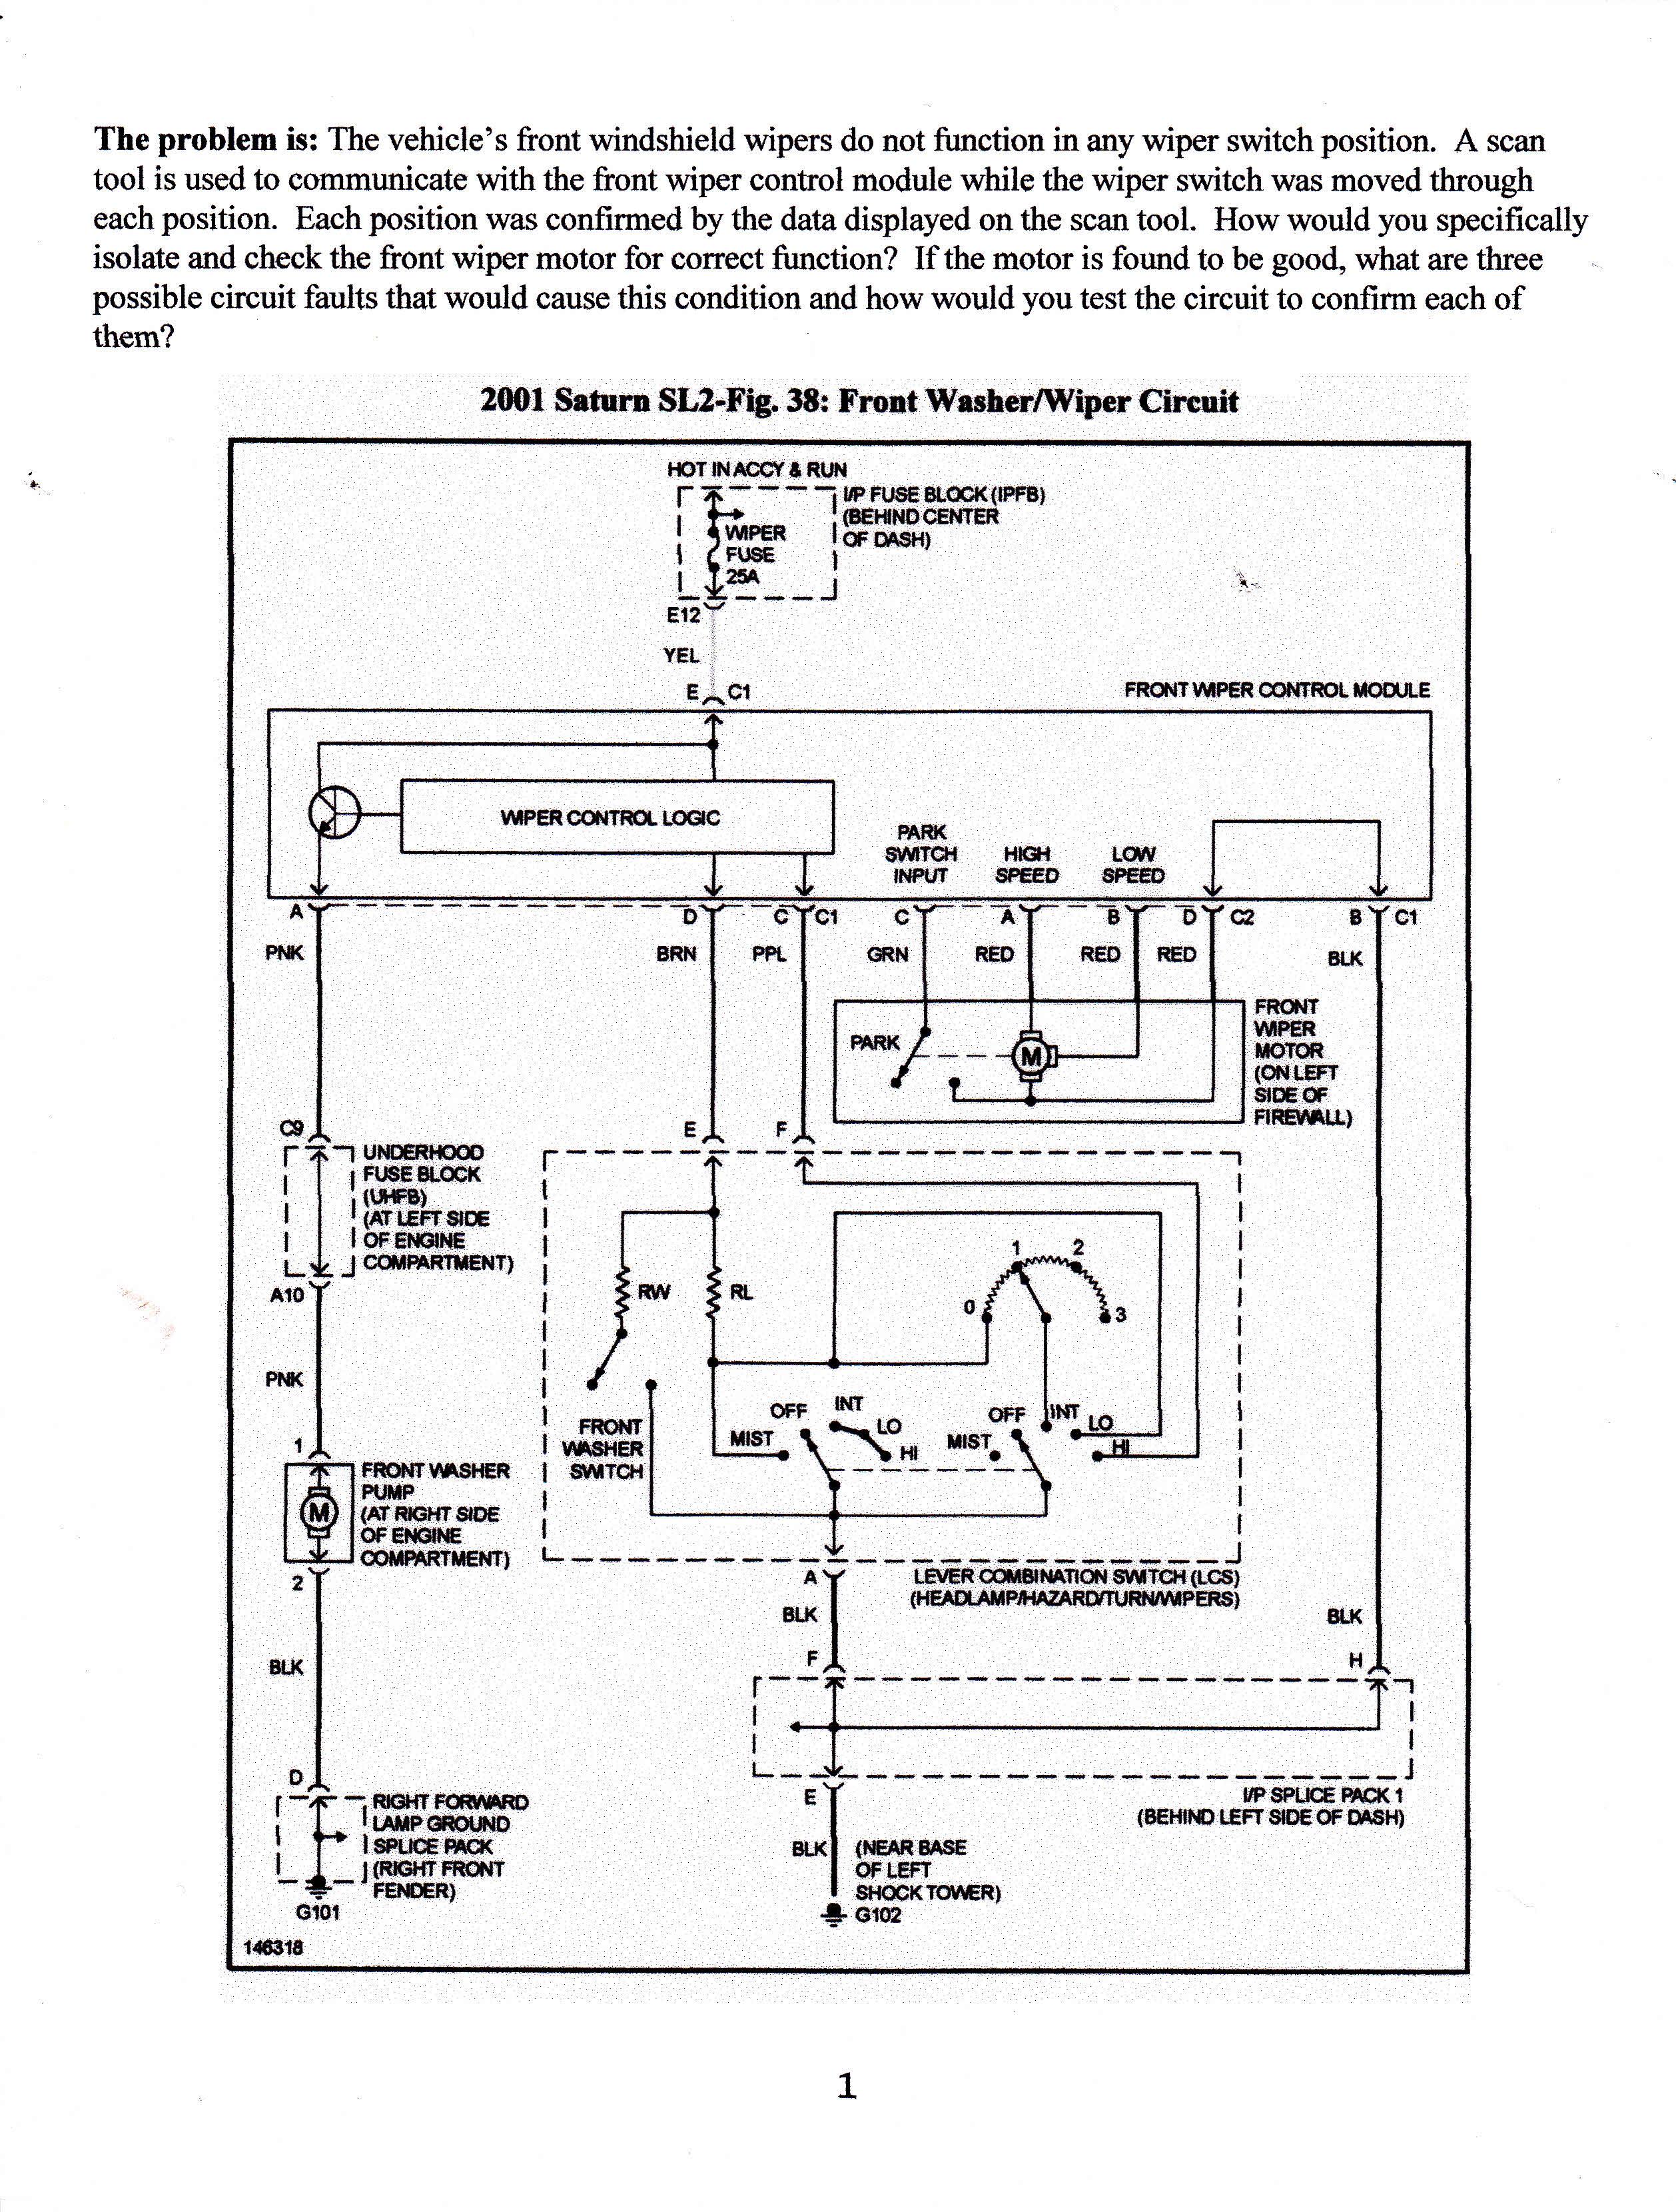 2001 saturn sl2 fuse box diagram wiring diagrams 2001 Saturn Sl2 Wiring Diagram